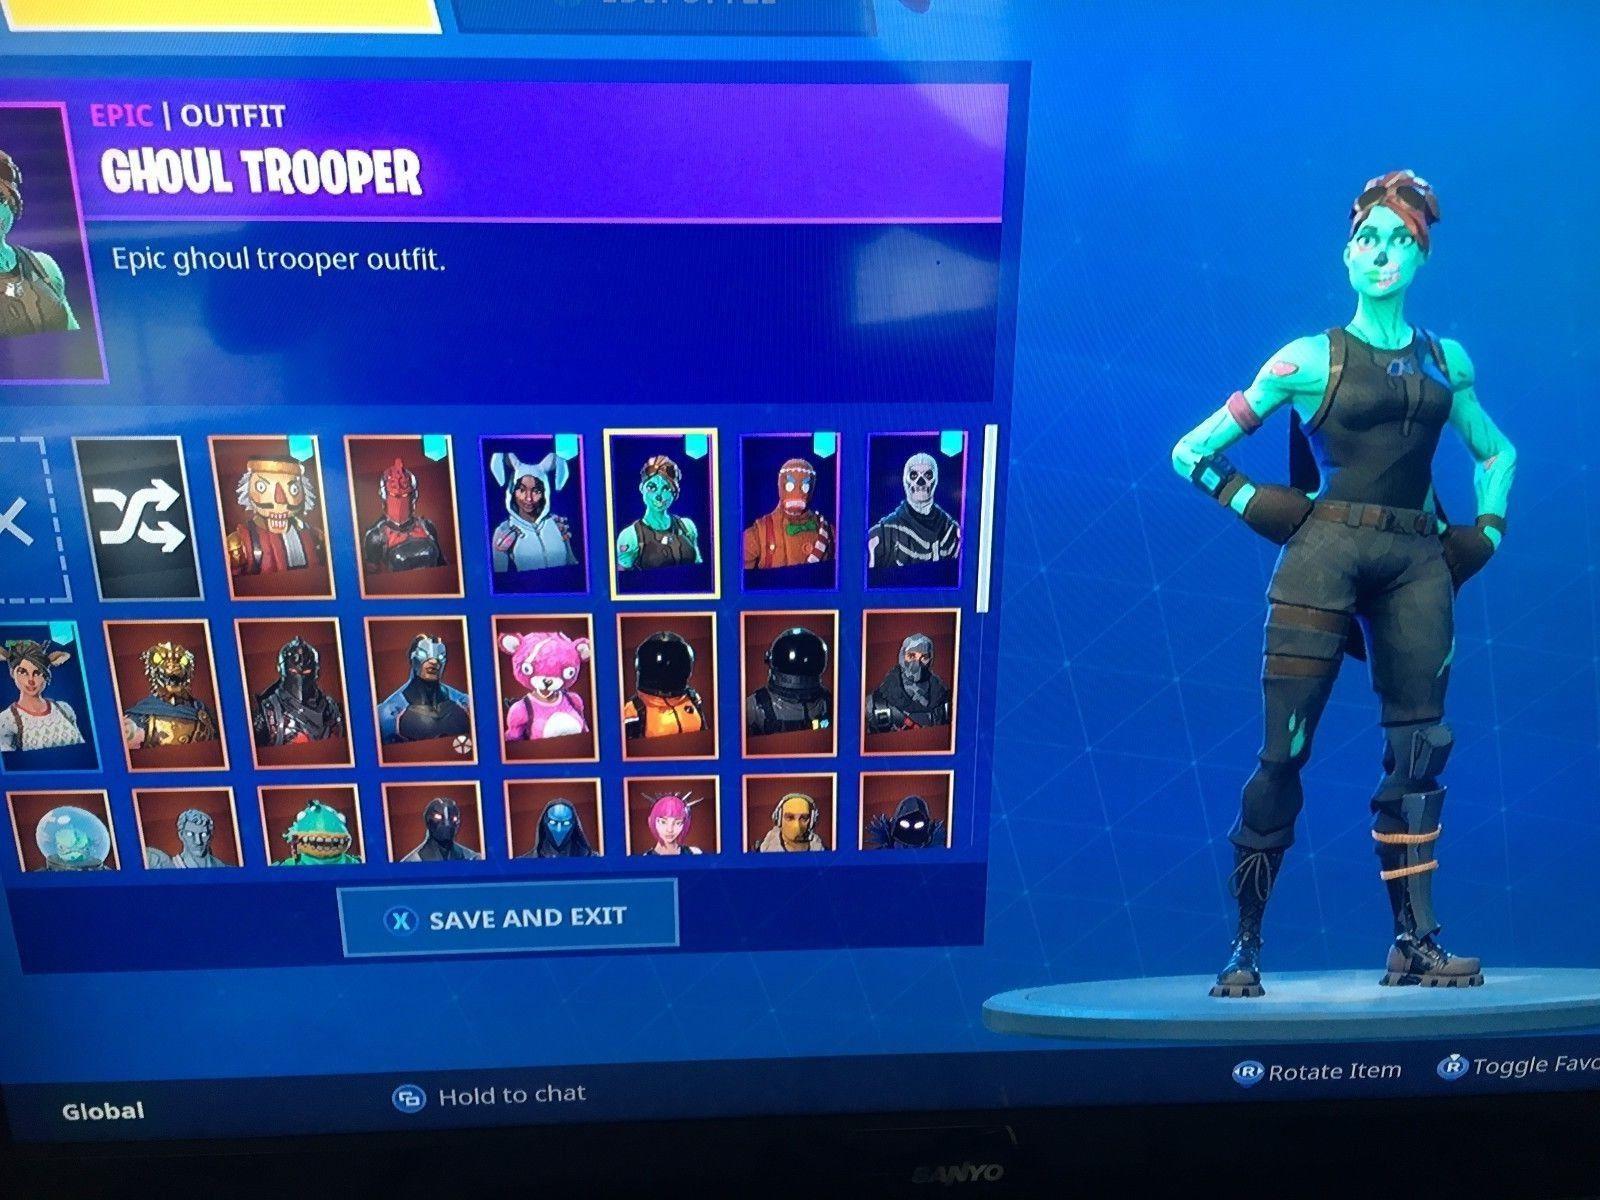 fortnite account skull trooper and ghoul trooper super rare and og - fortnite account ps4